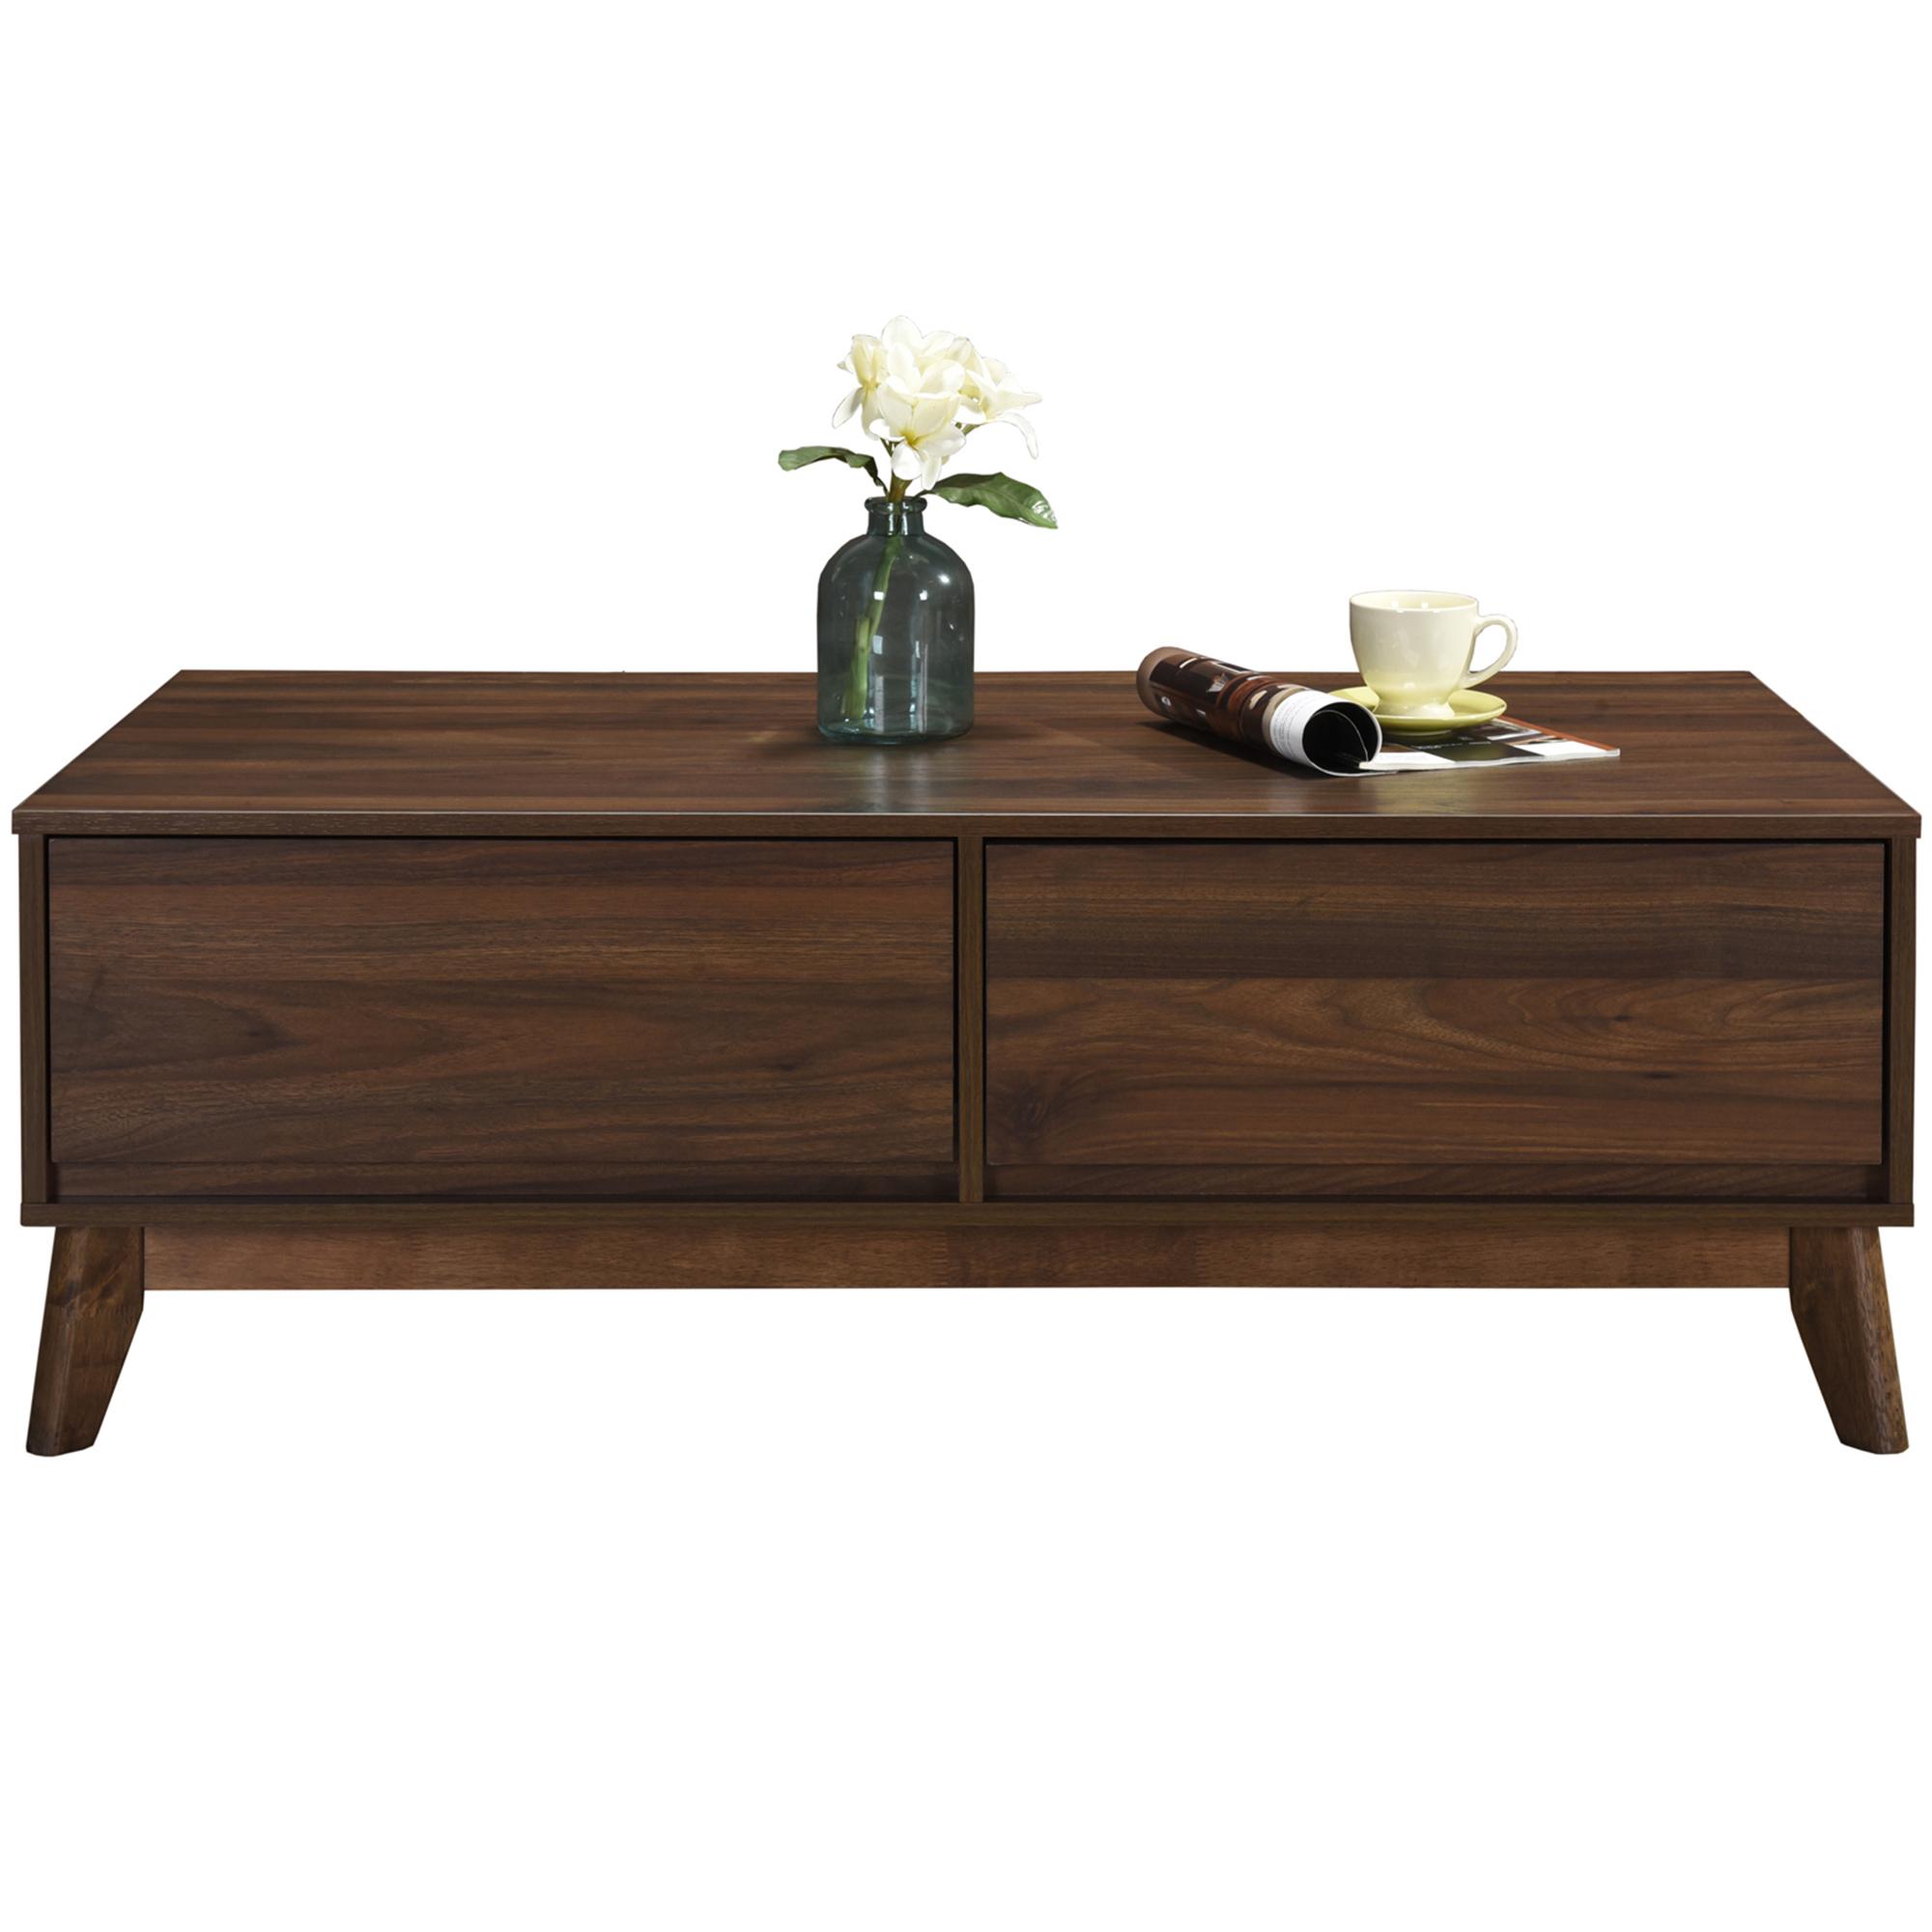 Rubberwood Coffee Table.Walnut Anderson Coffee Table